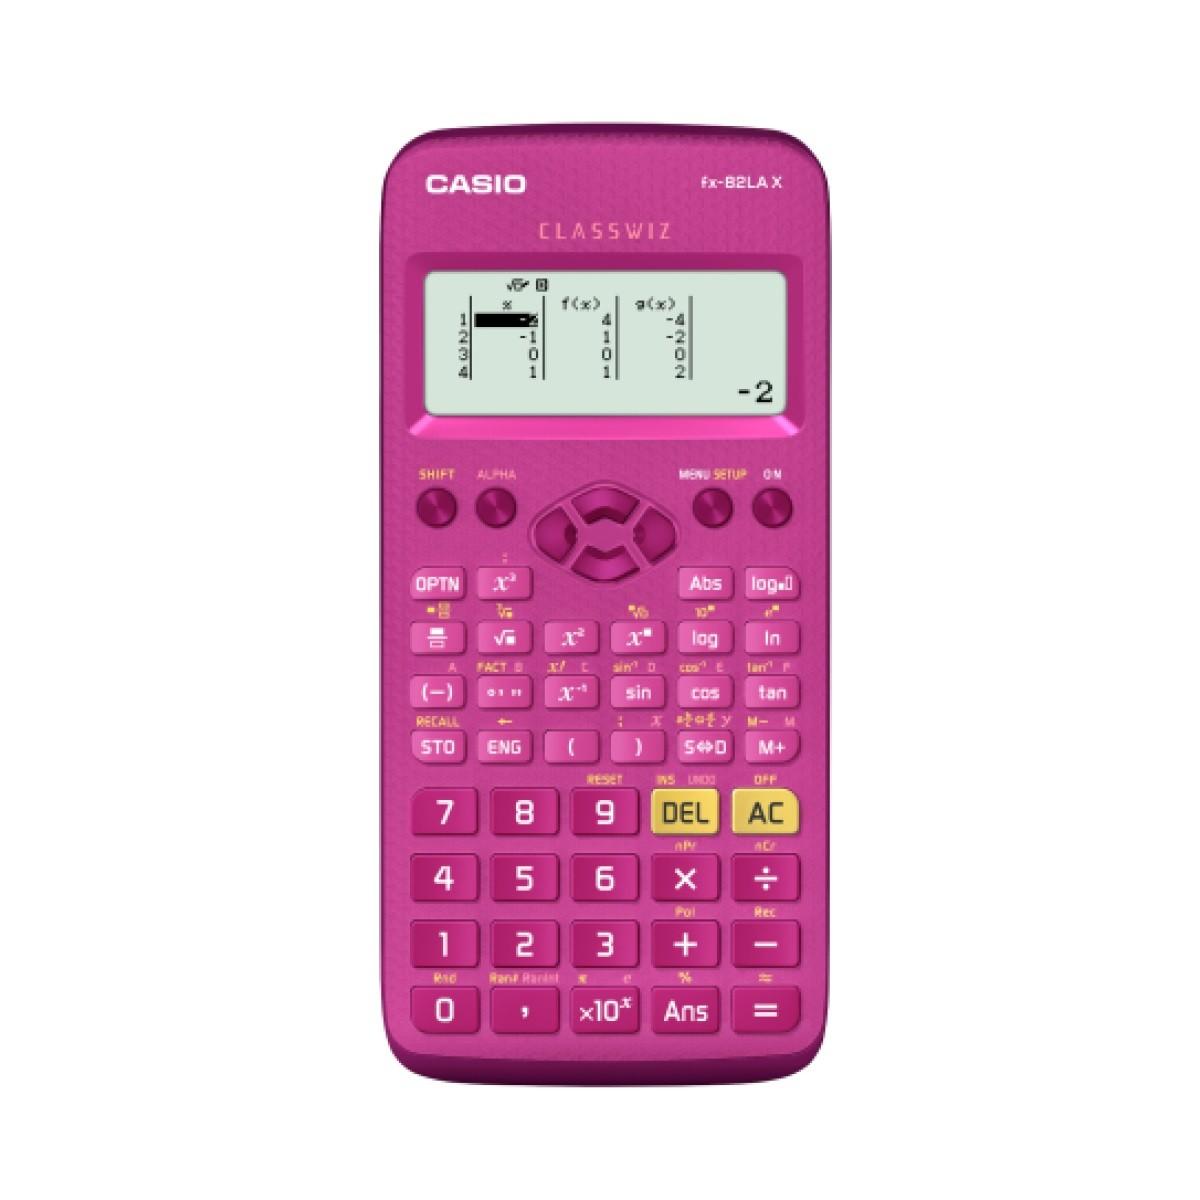 Calculadora Casio Fx-82Lax-Pk Pink Programável Cientifica Original 274 Funções